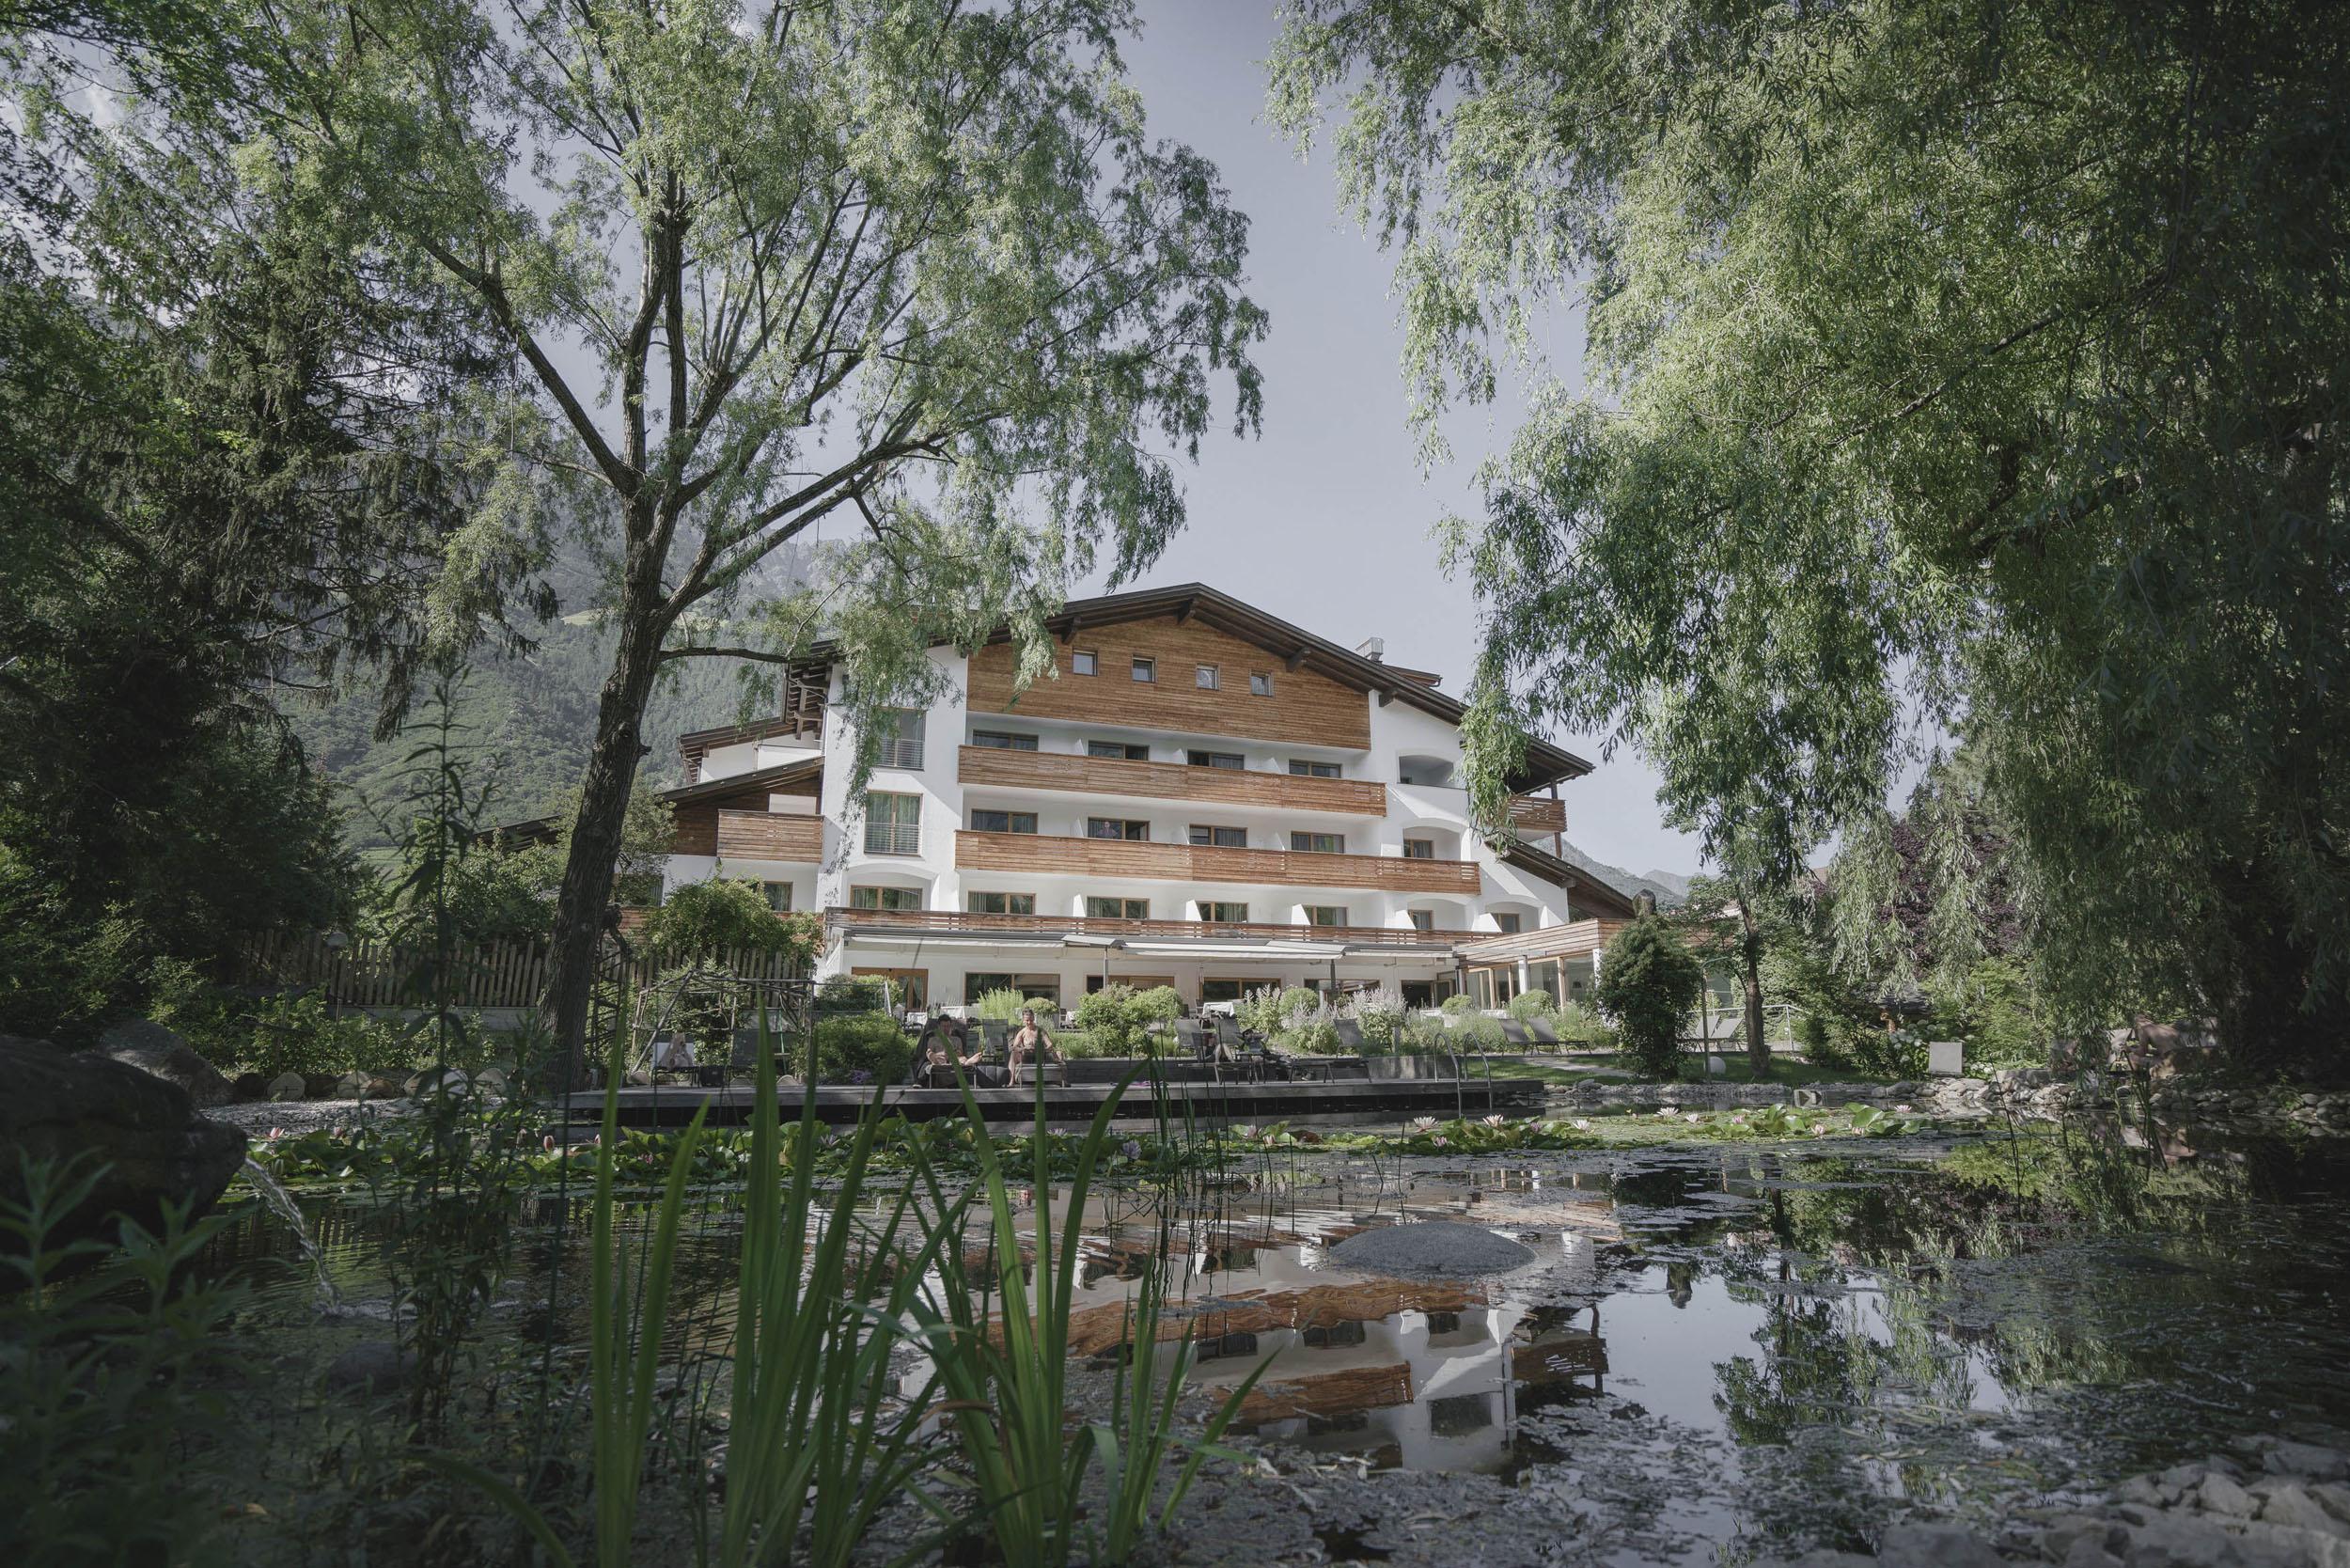 Biotique Hotel LA VIMEA